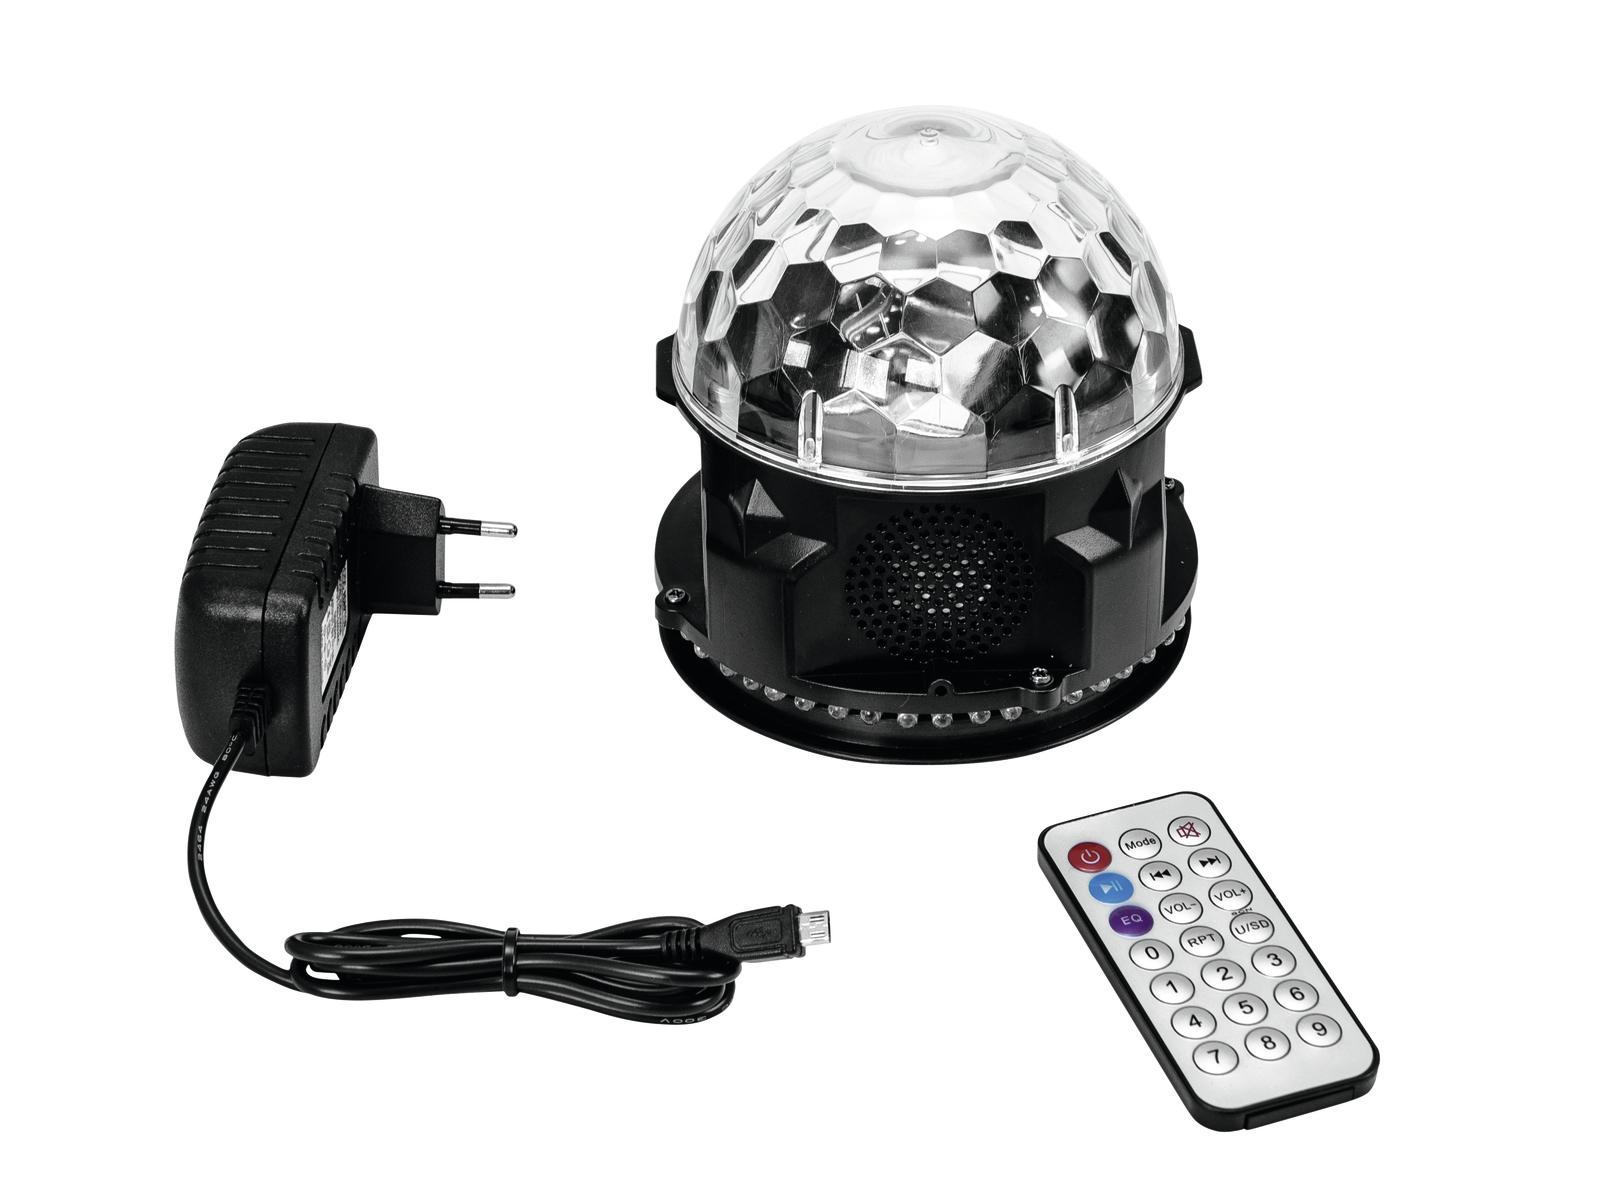 Eurolite Akku Mini BCW-4 RGB Flower Discokugel LED